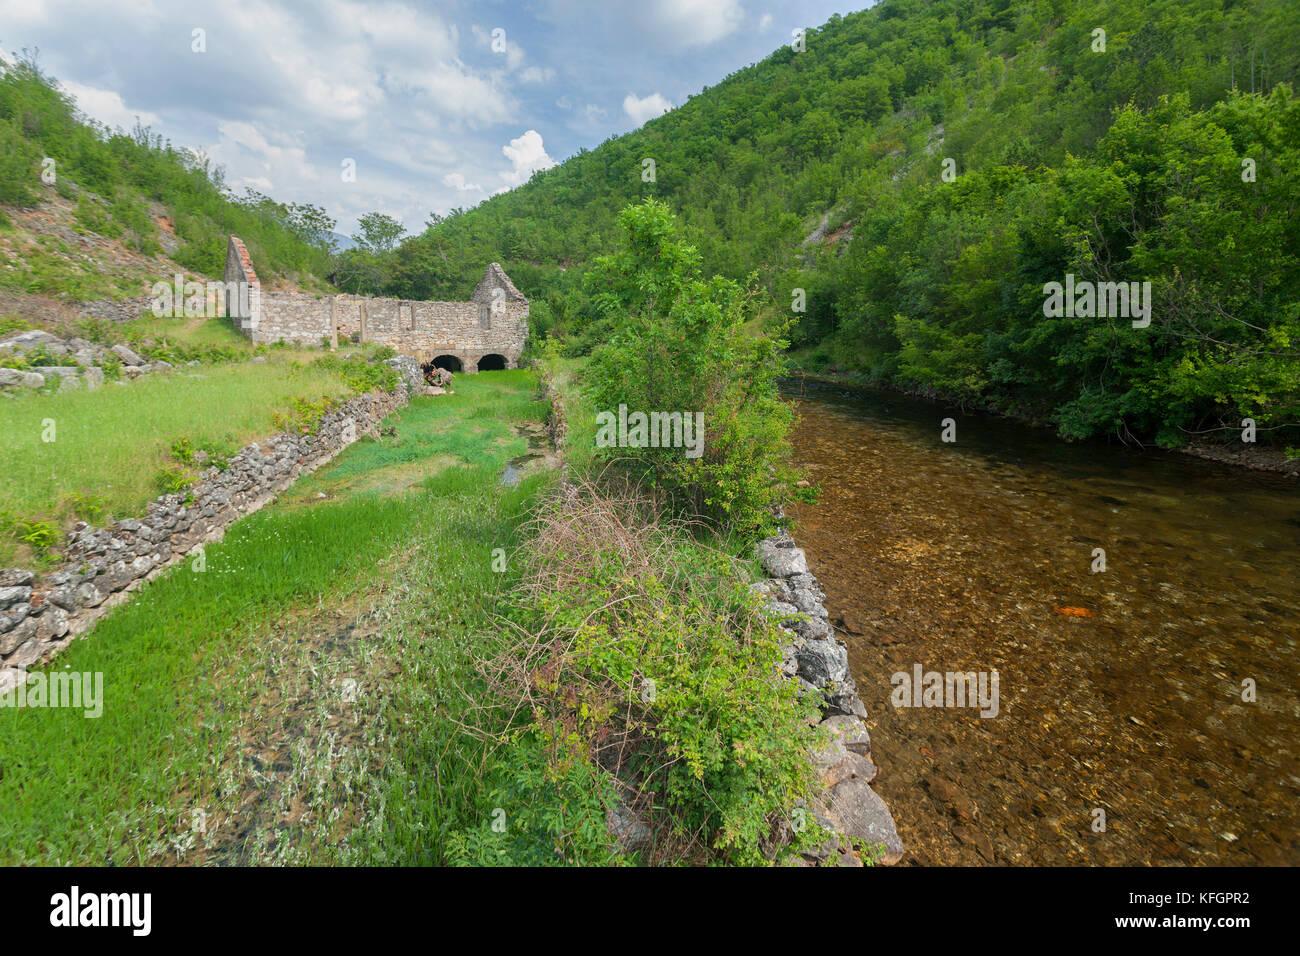 Fluss krcic in Kroatien Stockbild